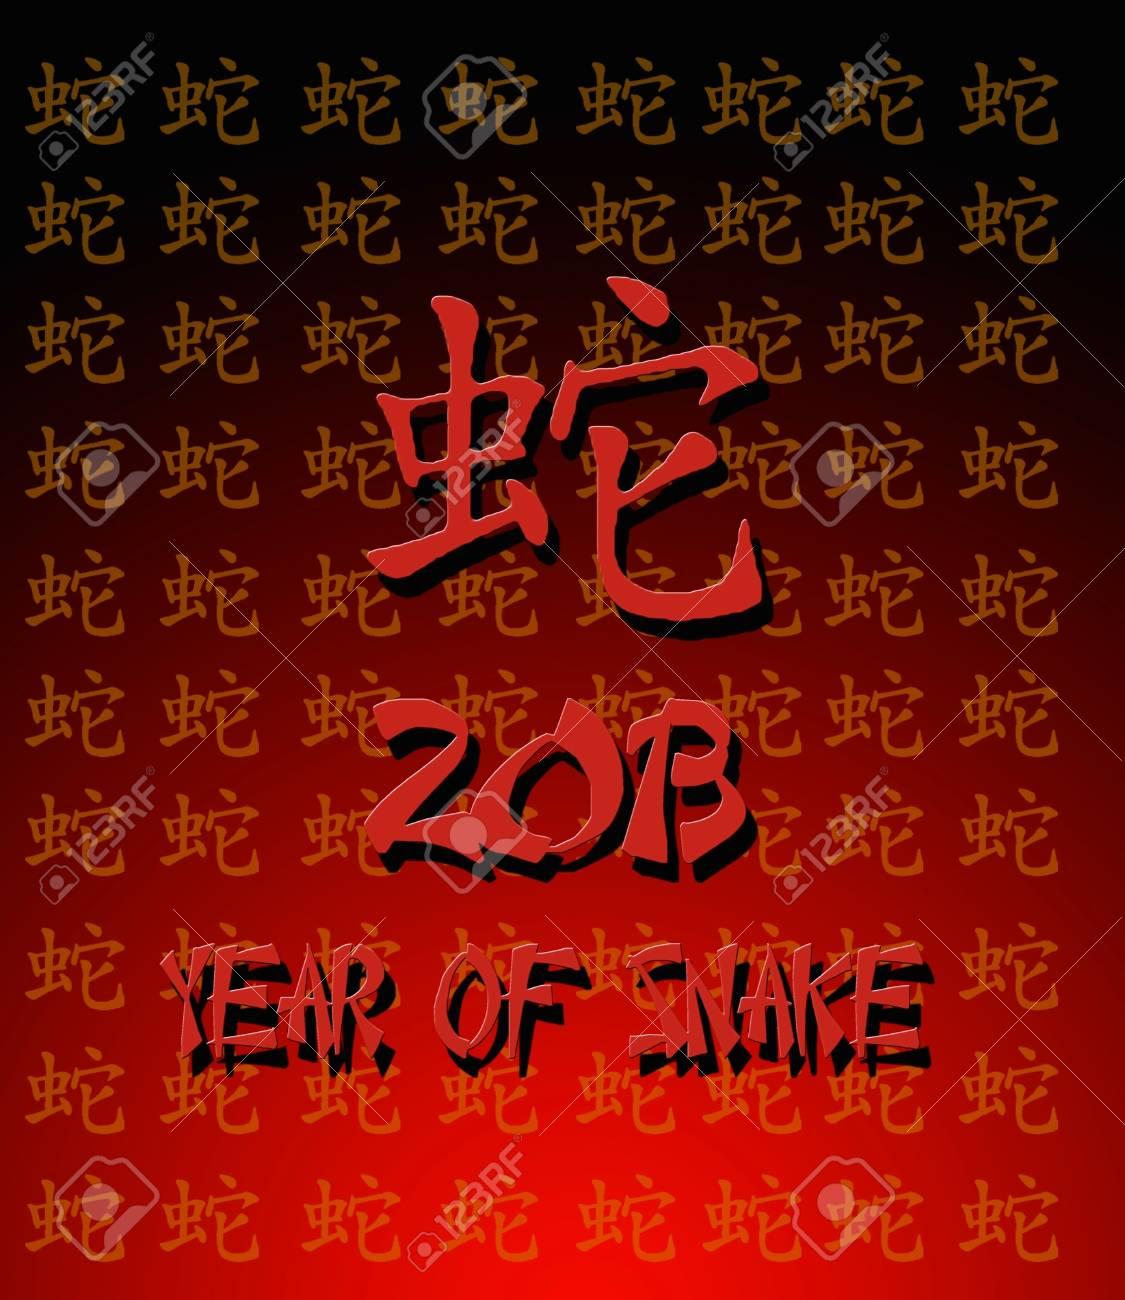 Illustration of Year of the snake 2013 Stock Illustration - 15504762